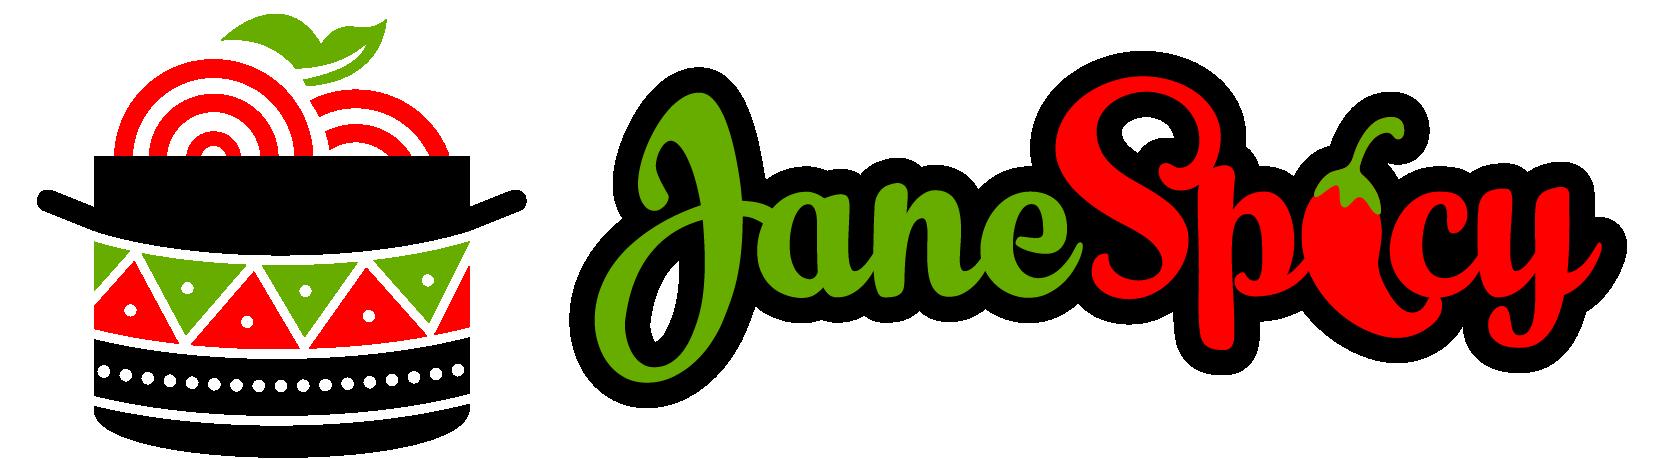 Janespice